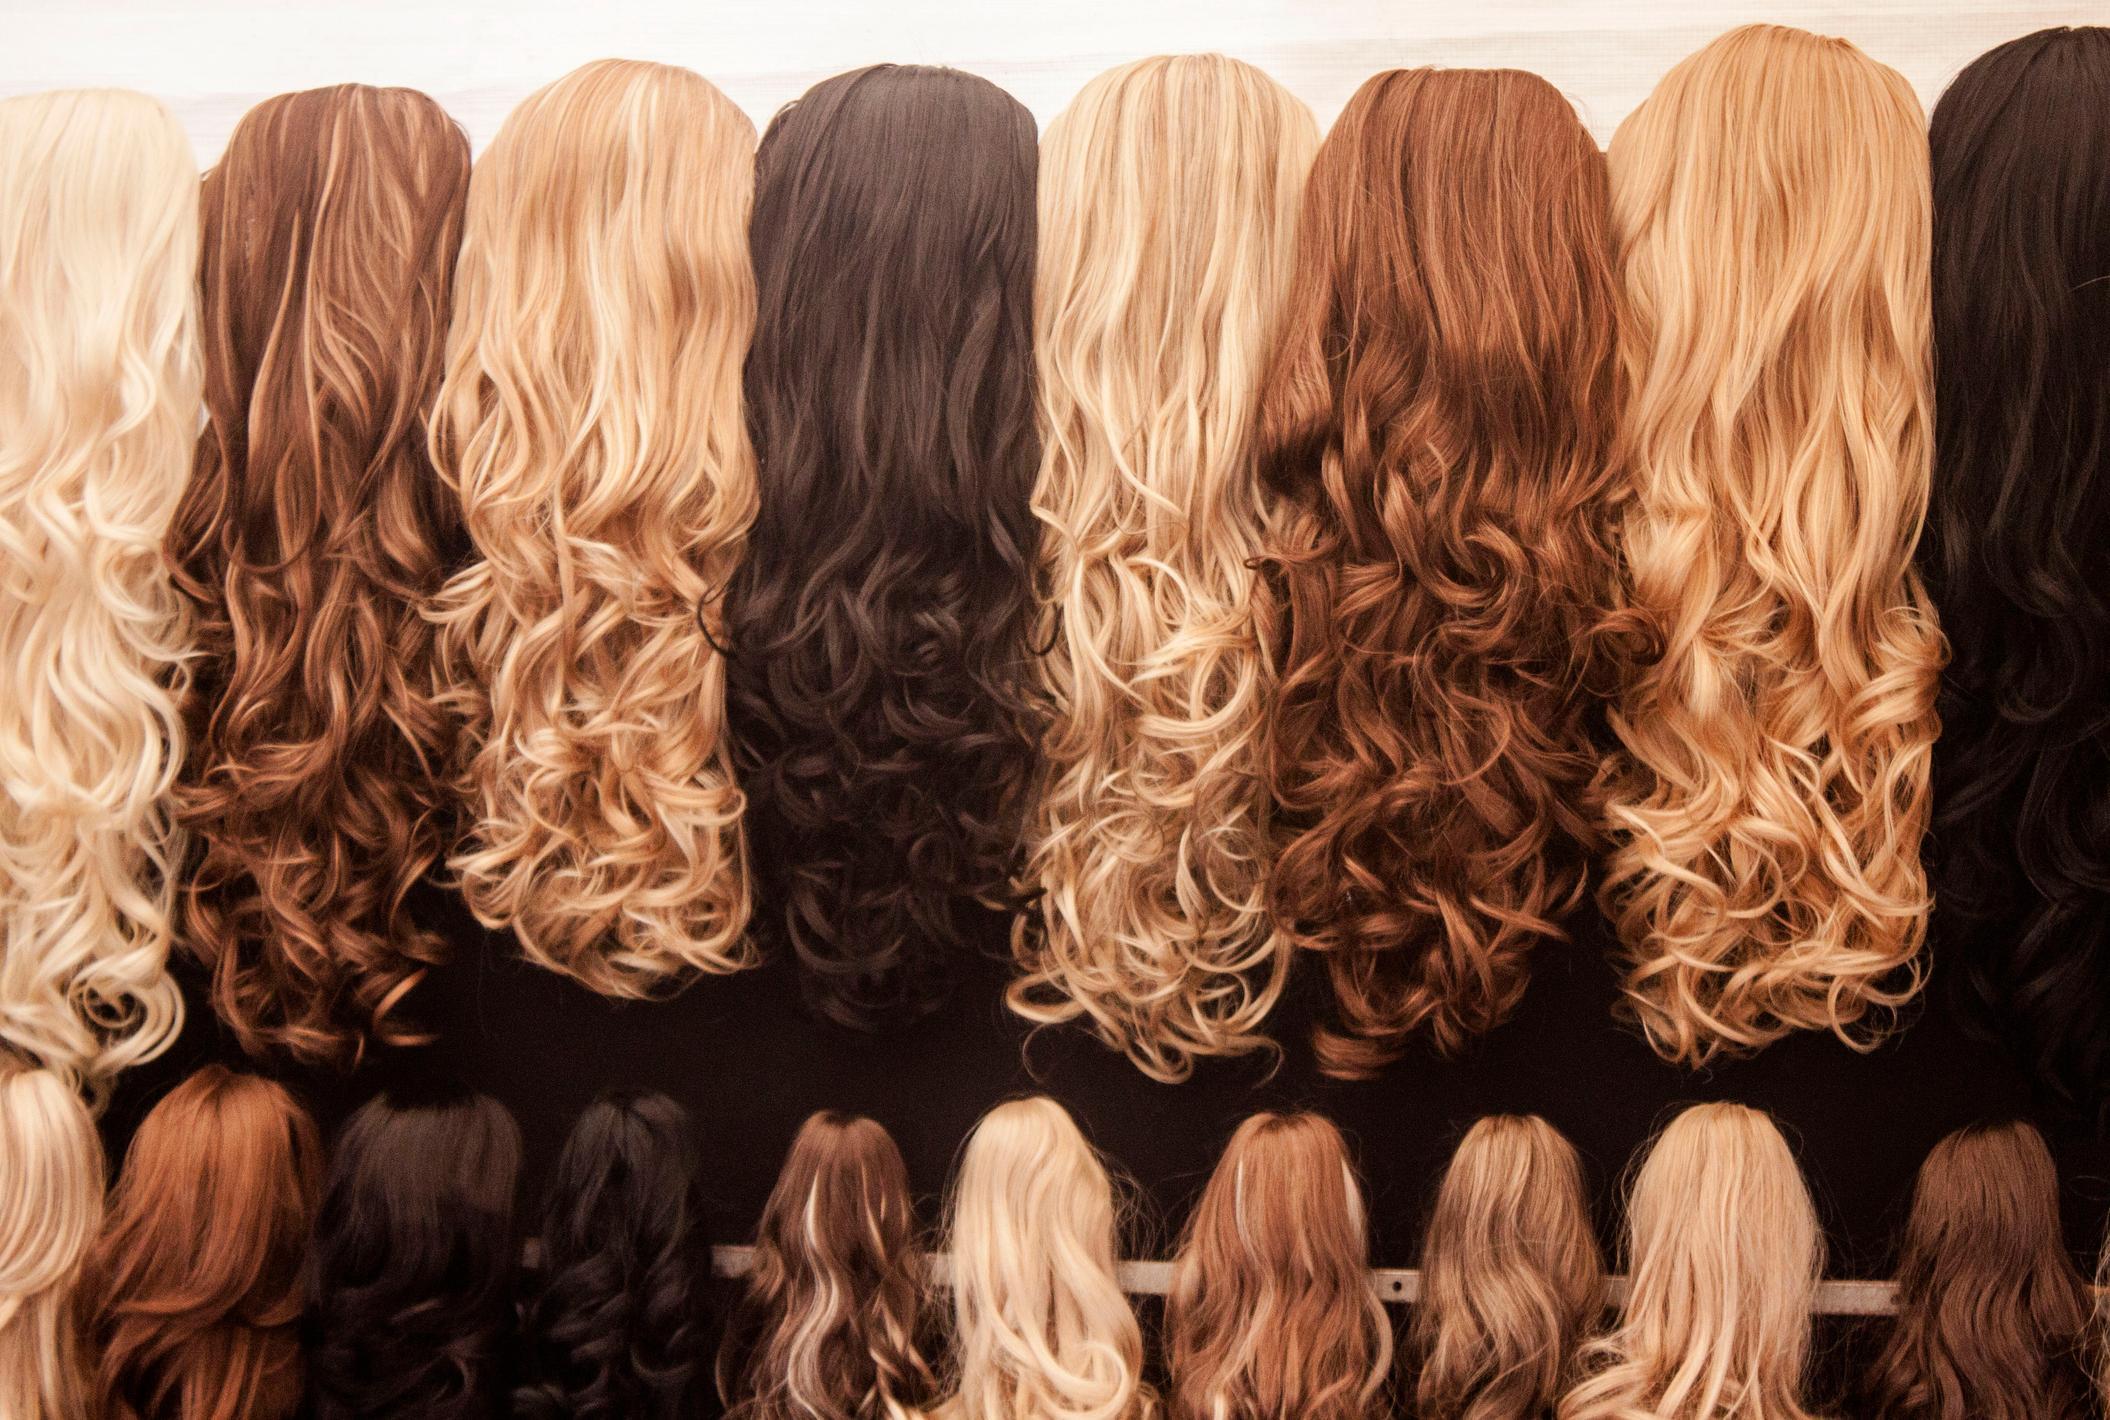 3-wig-bridezilla-1567004491199.jpg